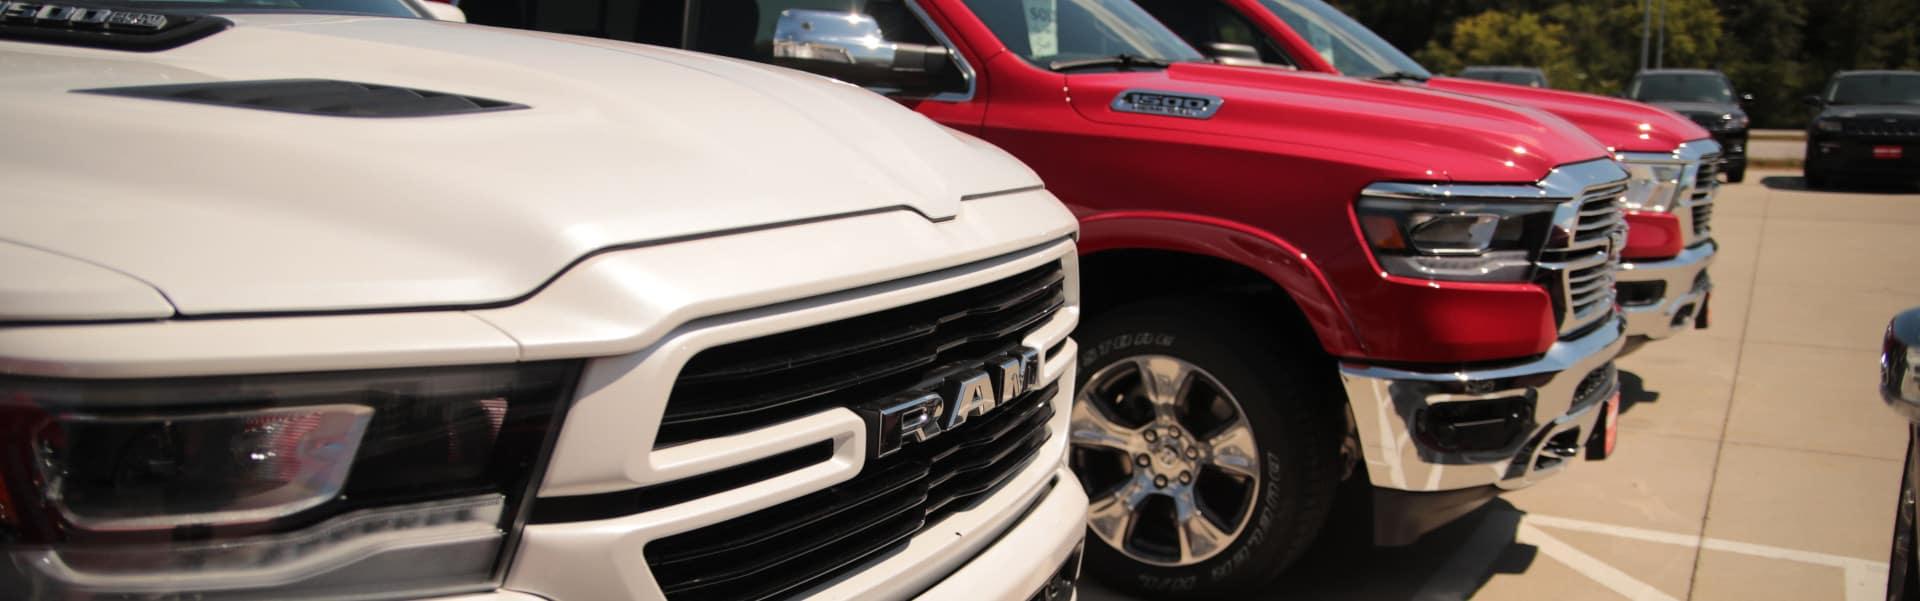 RAM Commercial Trucks in Ames, IA